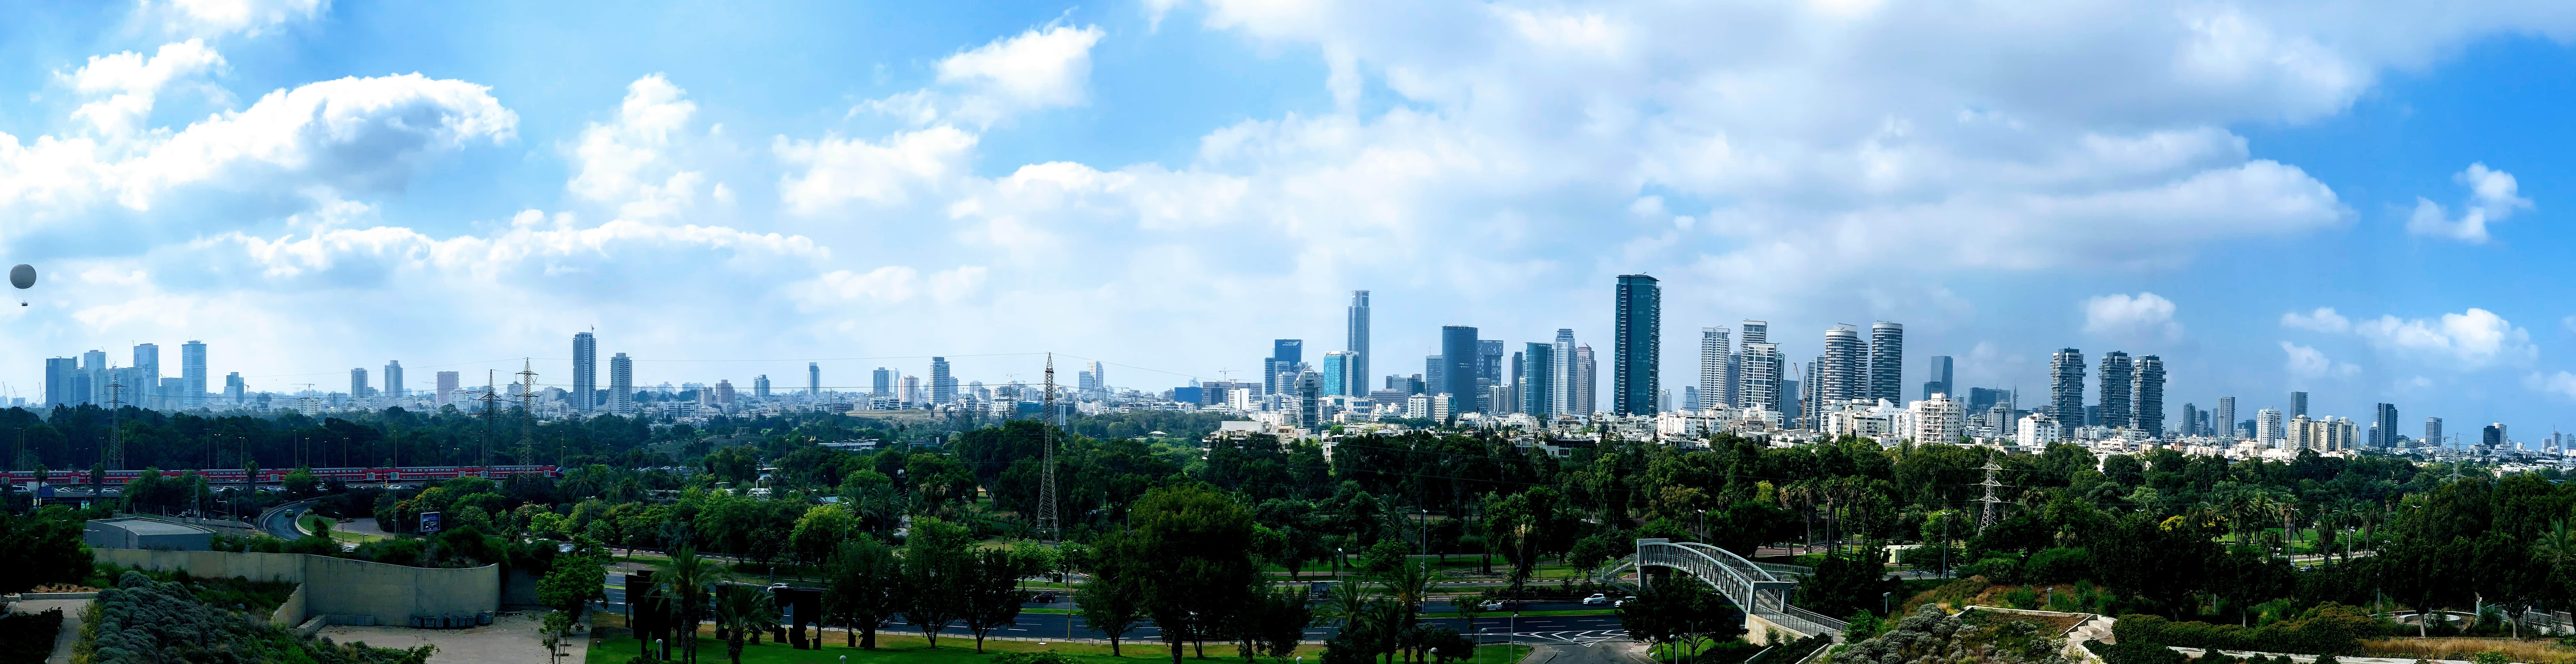 View of Tel Aviv from the Yitzhak Rabin Center